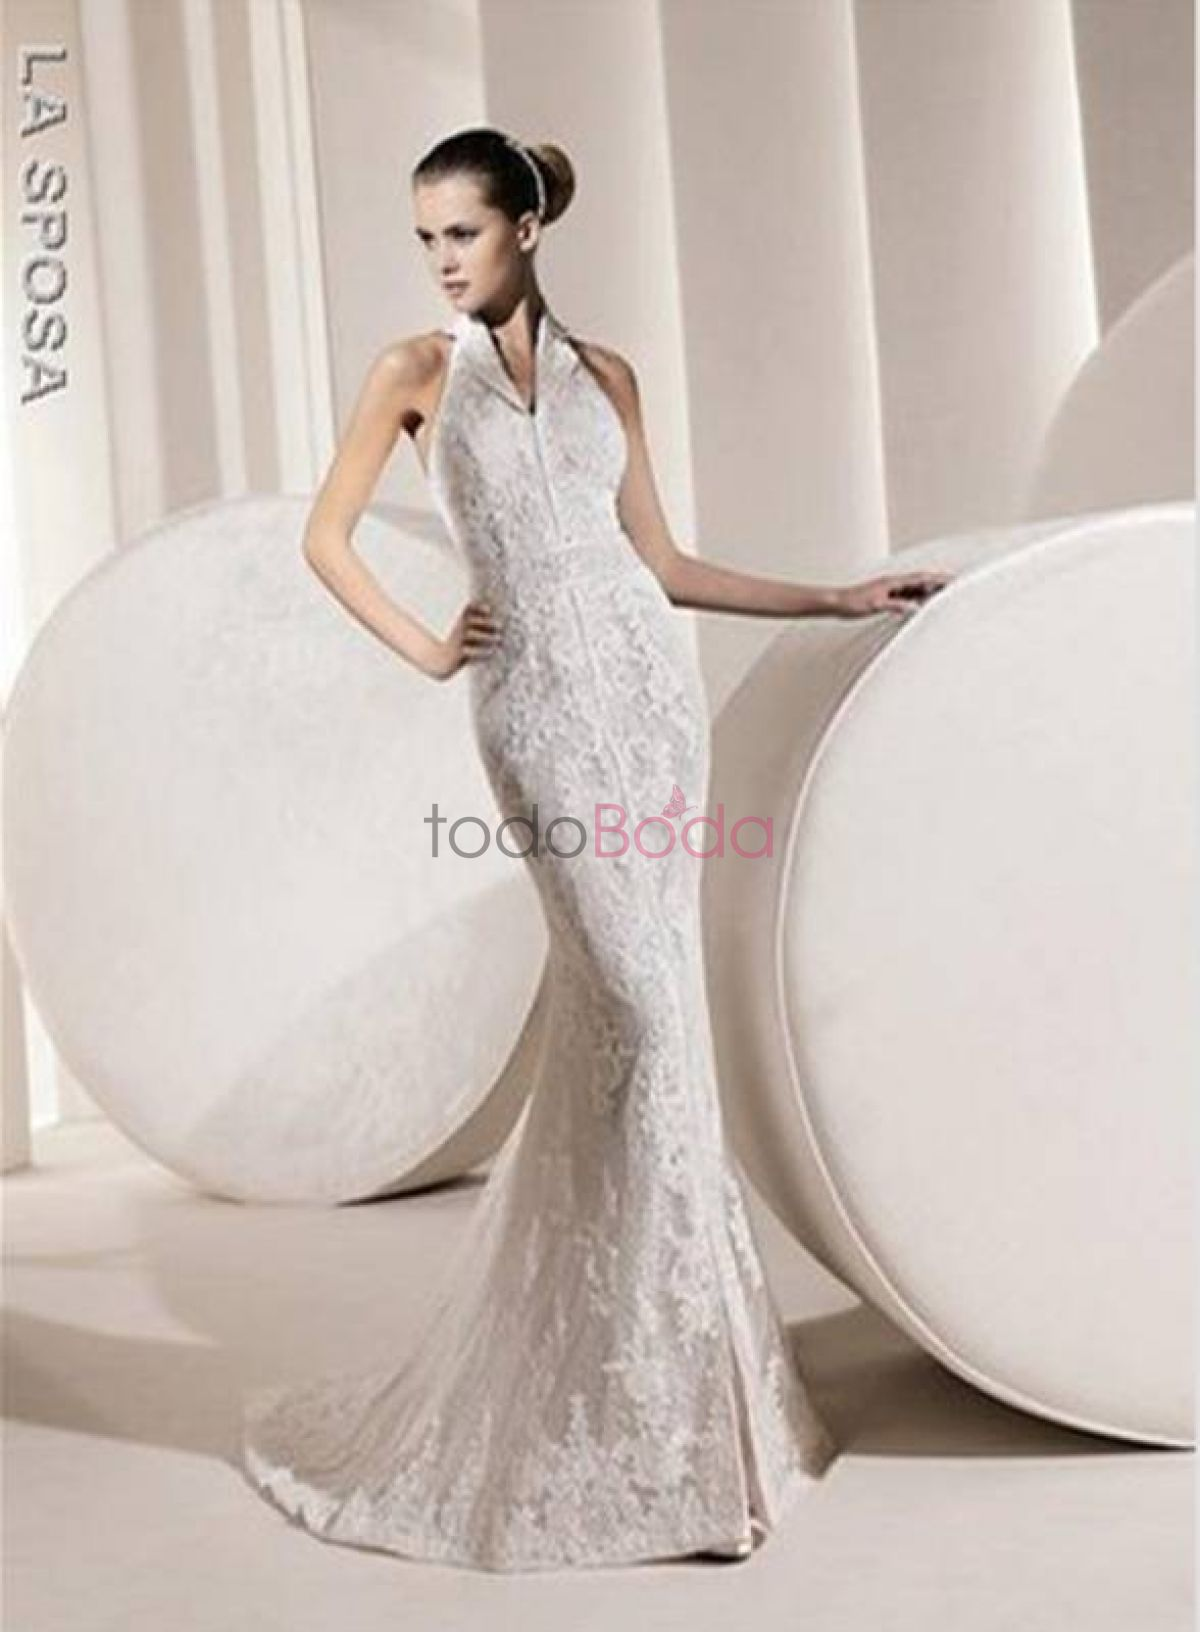 Comprar vestido invitada boda tenerife